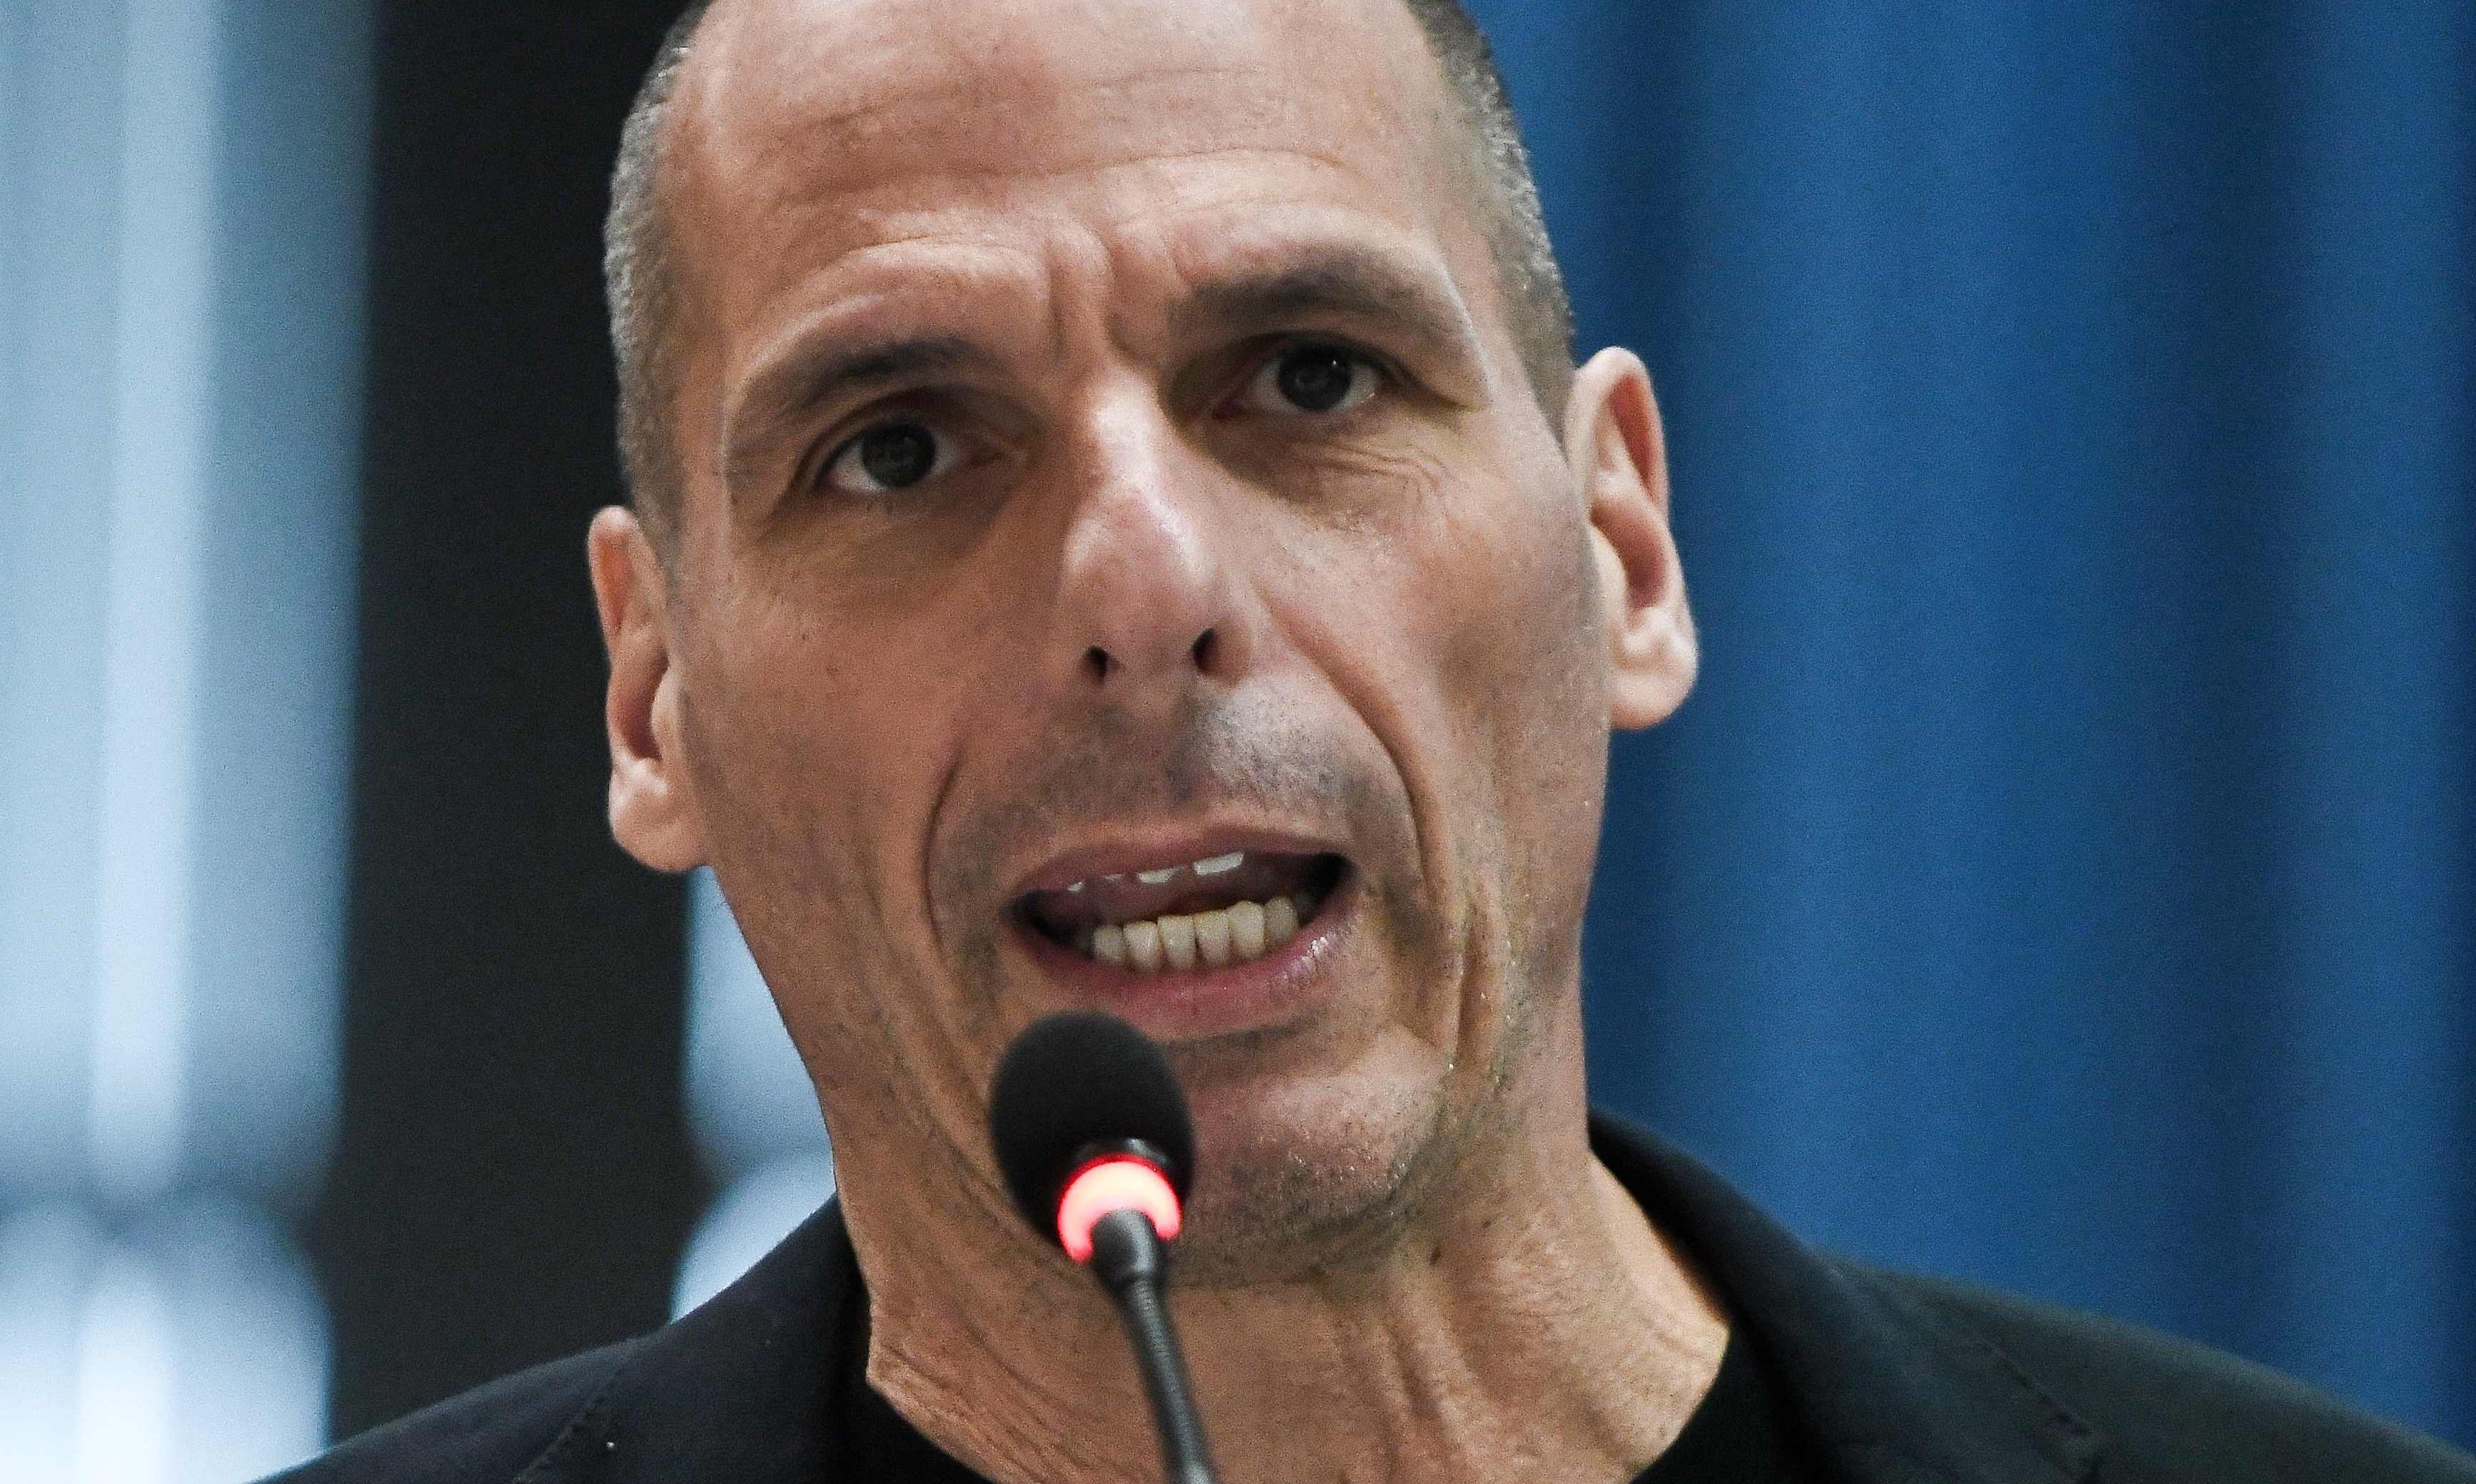 Yanis Varoufakis: Green New Deal can unite Europe's progressives